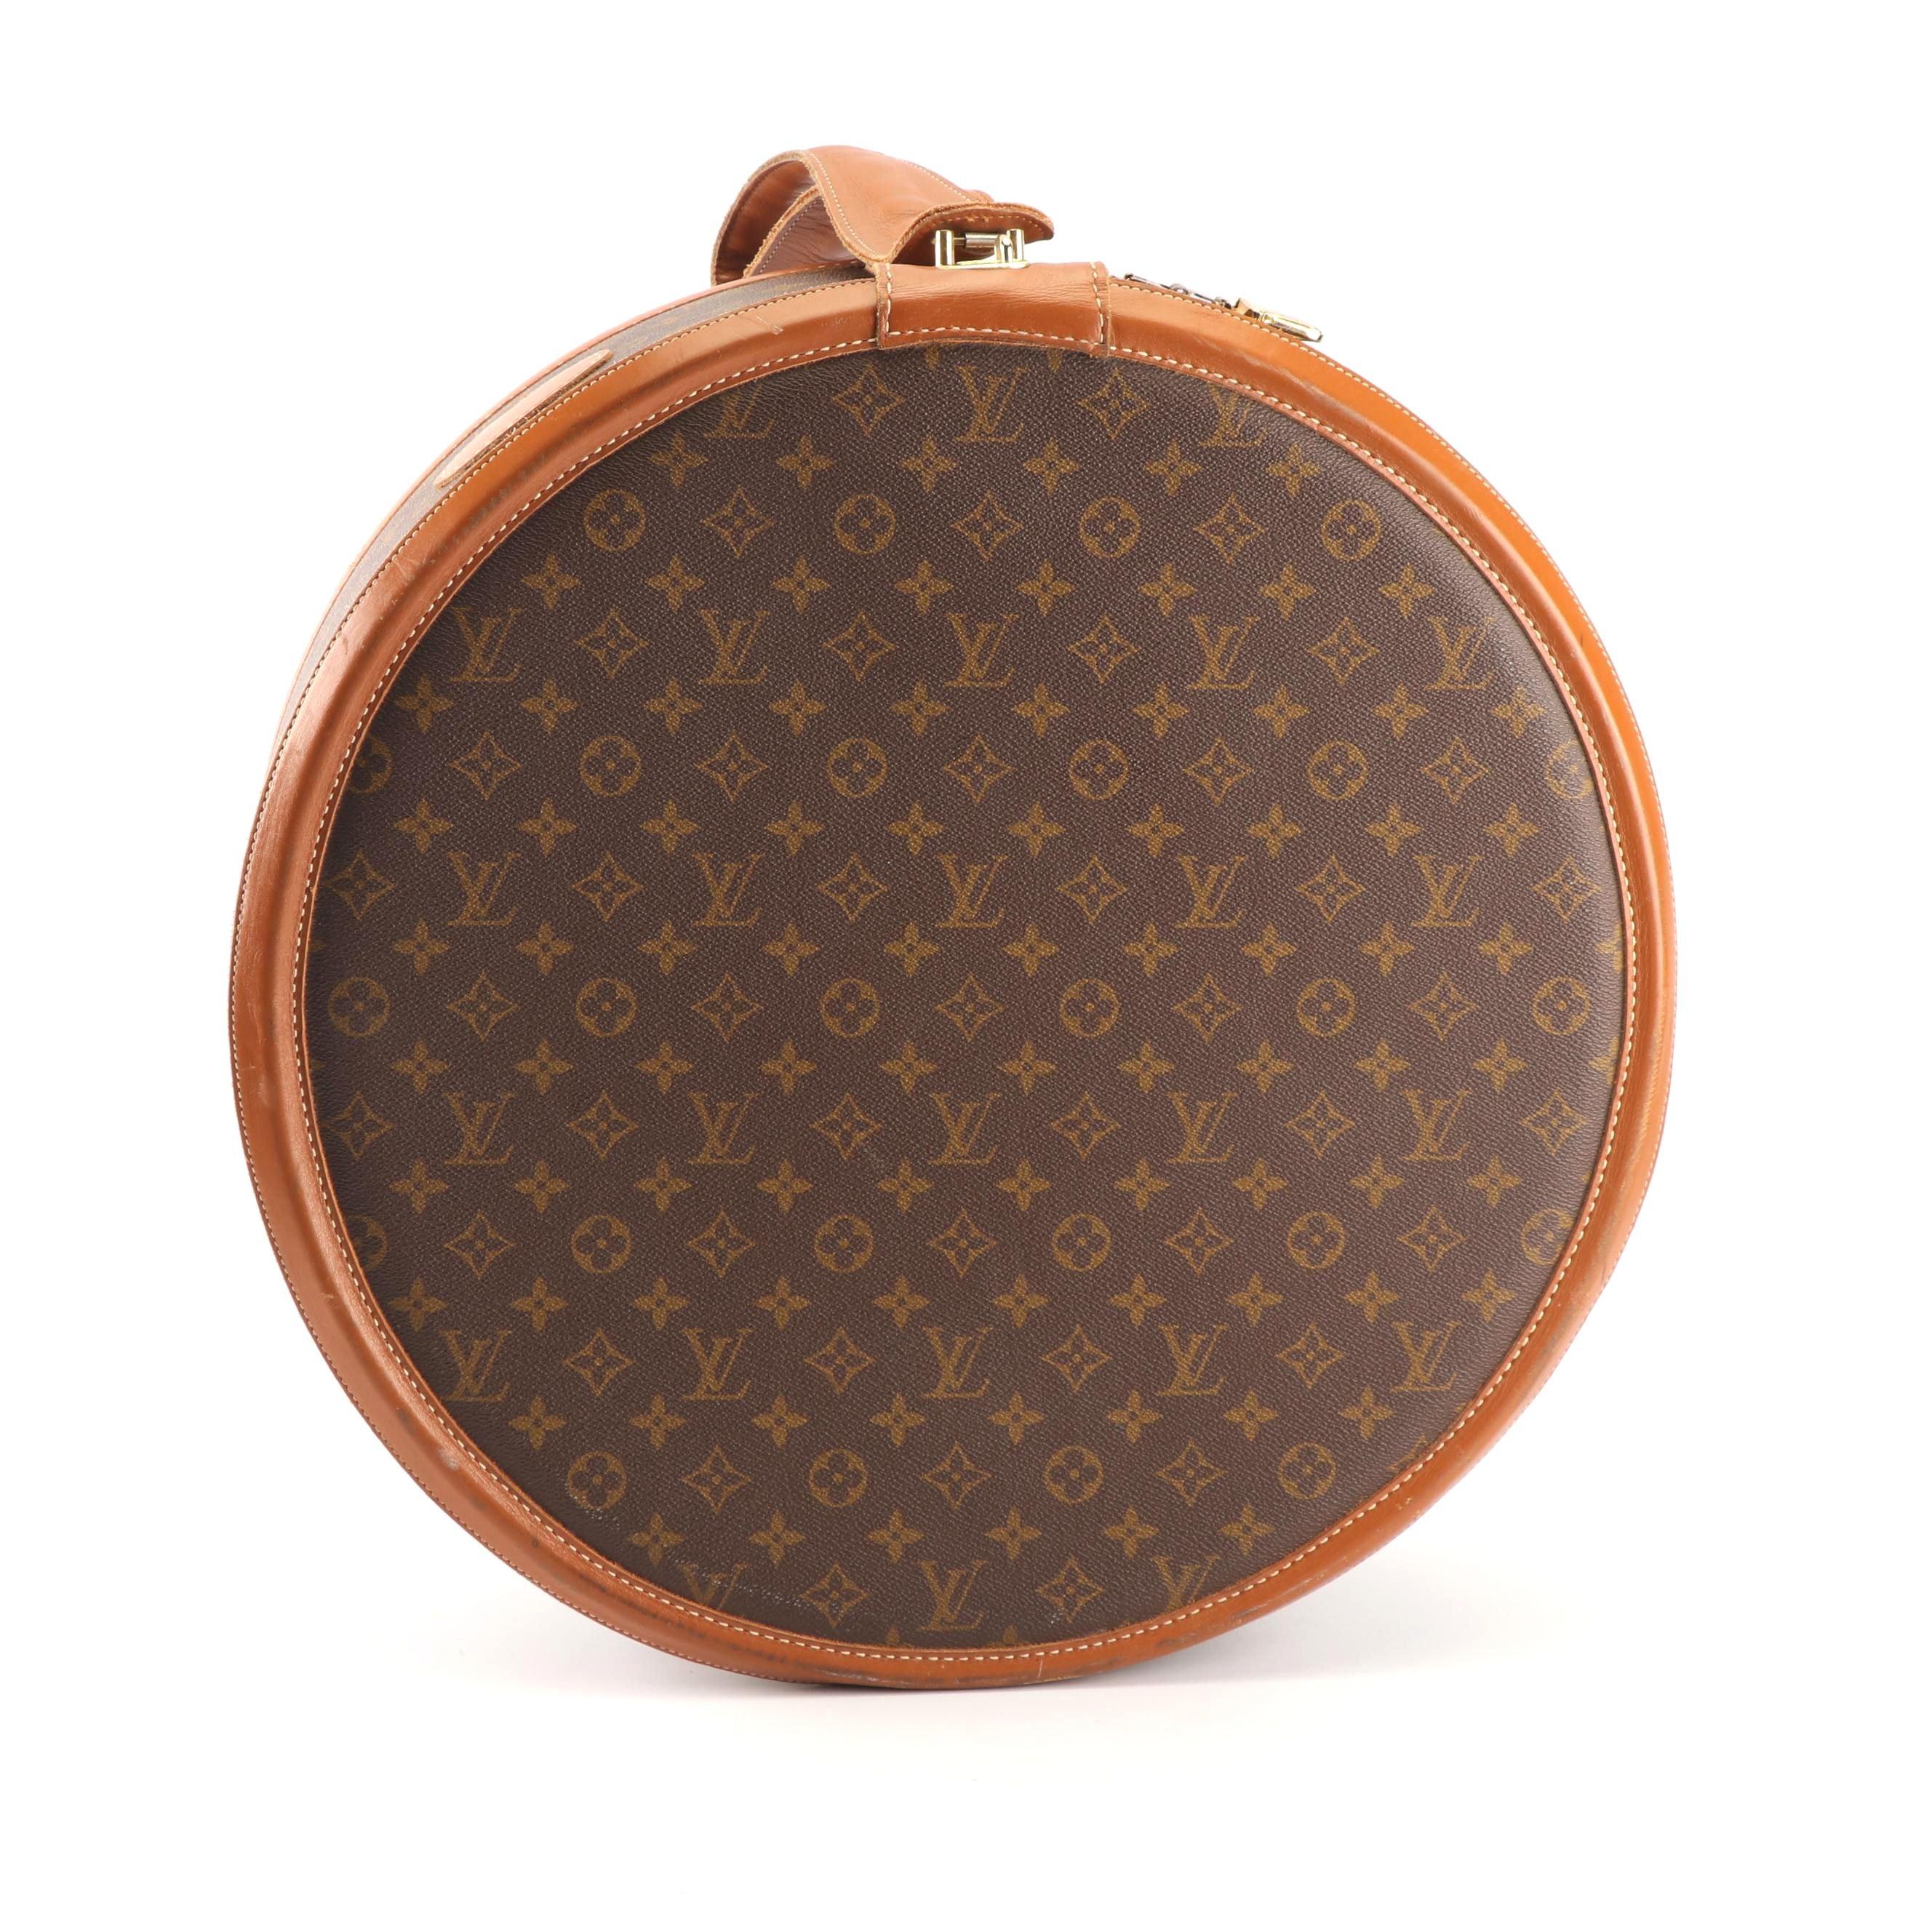 1970s Louis Vuitton The French Company Boite Chapeaux Round Hat Box